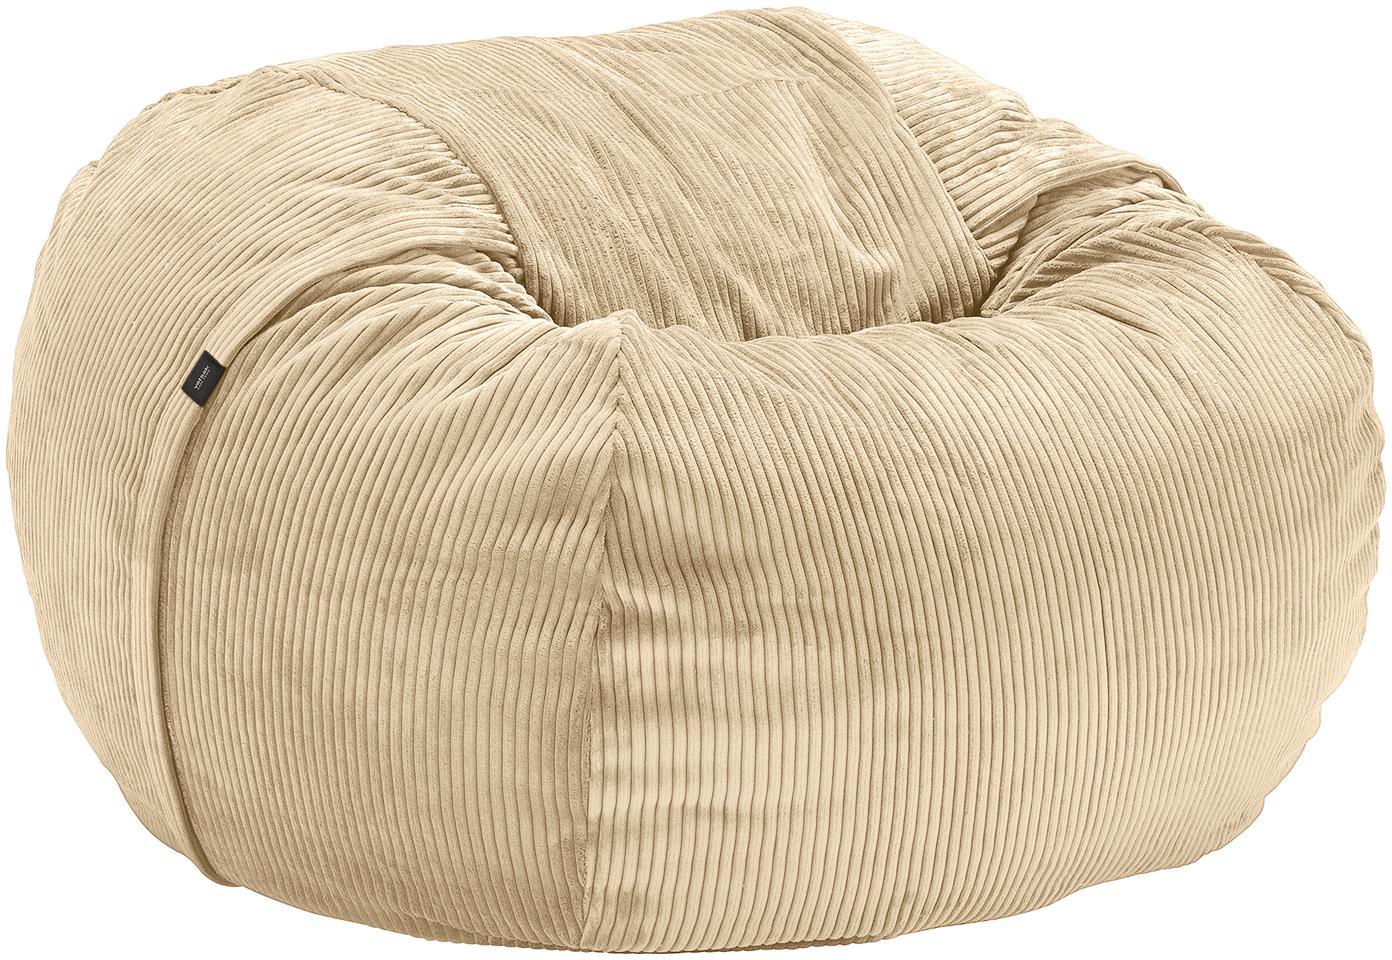 Cord-Sitzsack Velours, Bezug: 88% Nylon, 12% Polyester , Beige, Ø 110 x H 70 cm